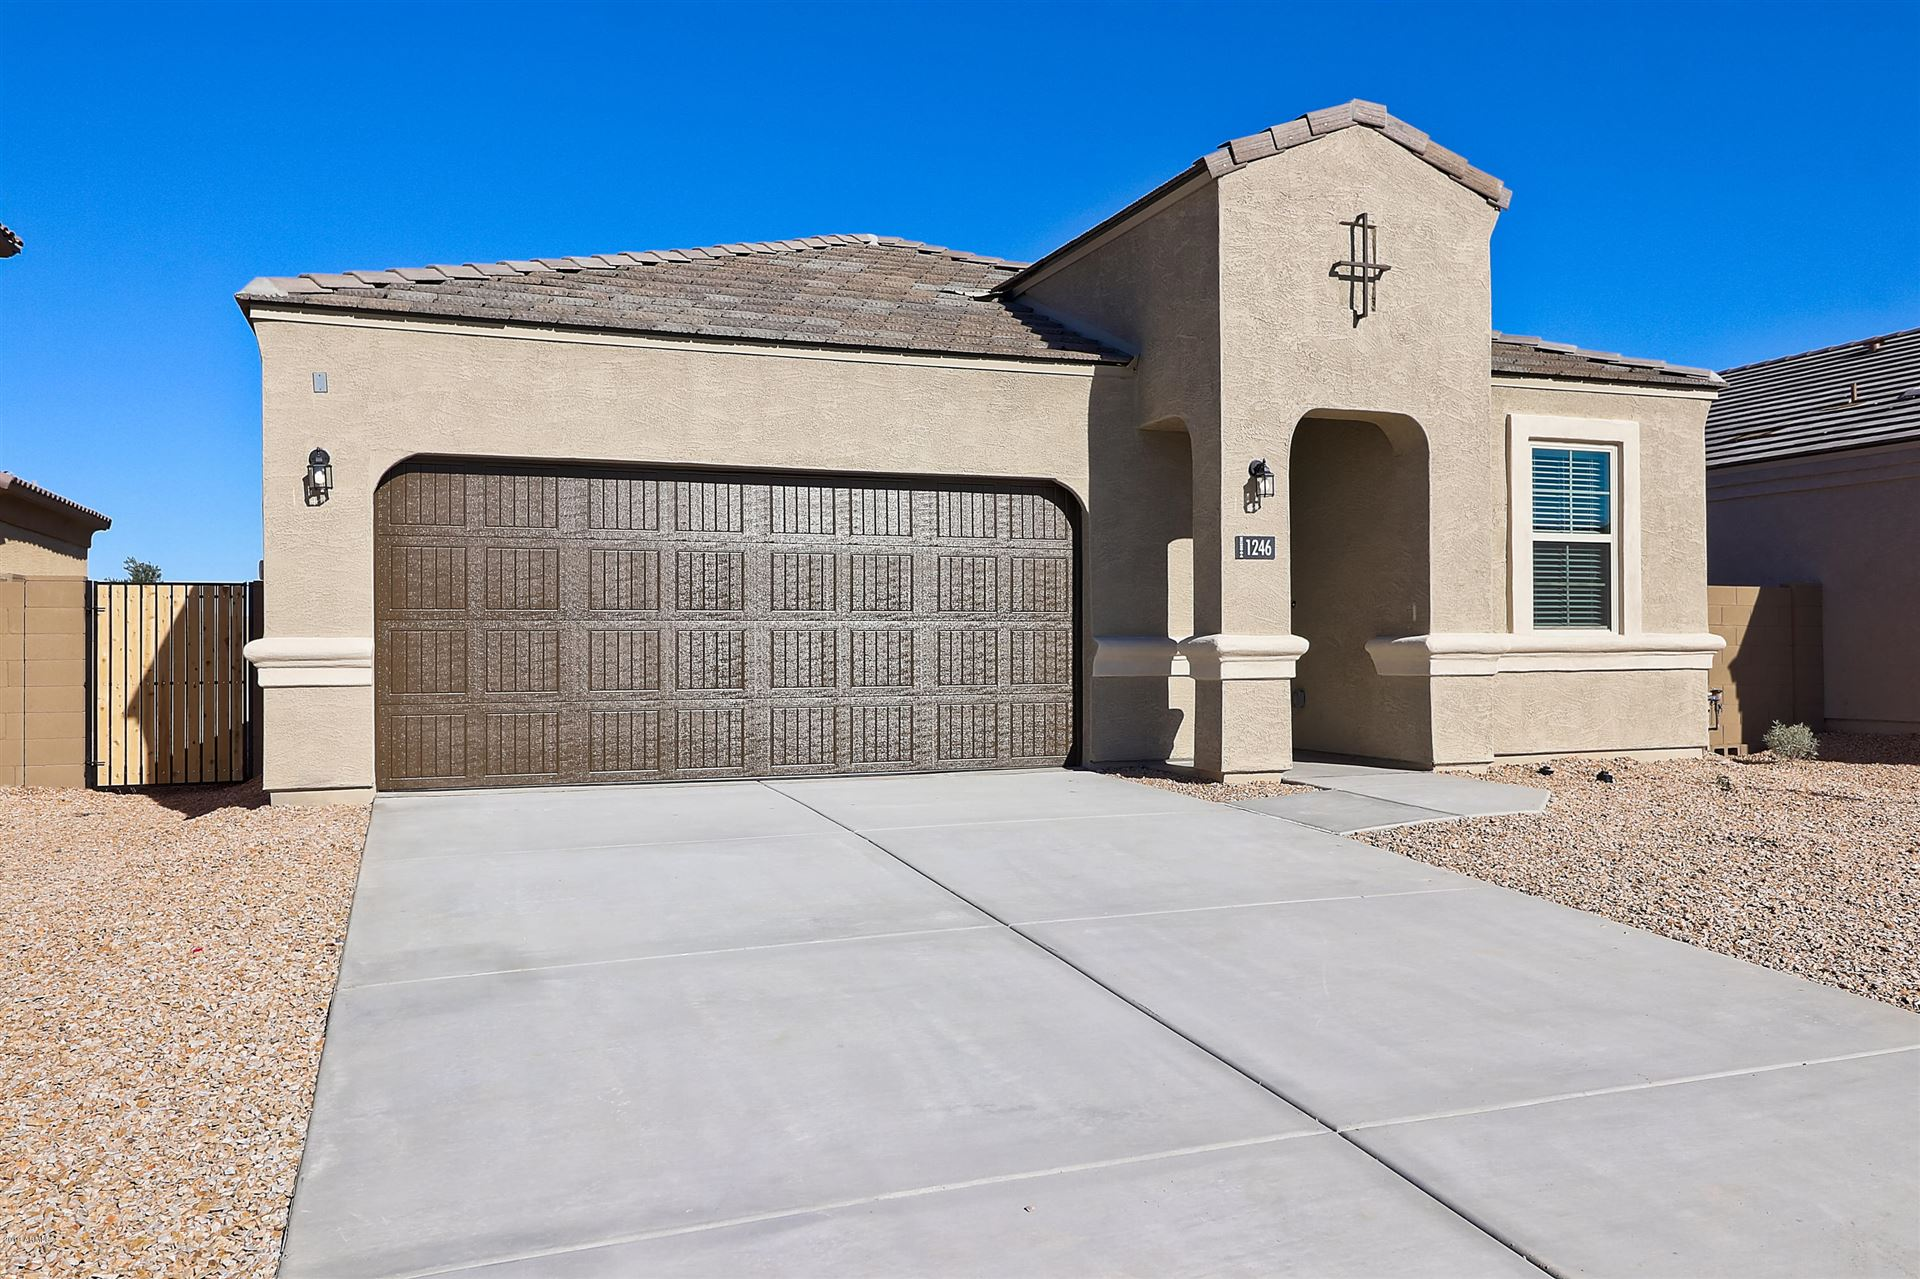 35973 W SEVILLE Drive, Maricopa, AZ 85138 - MLS#: 6125336